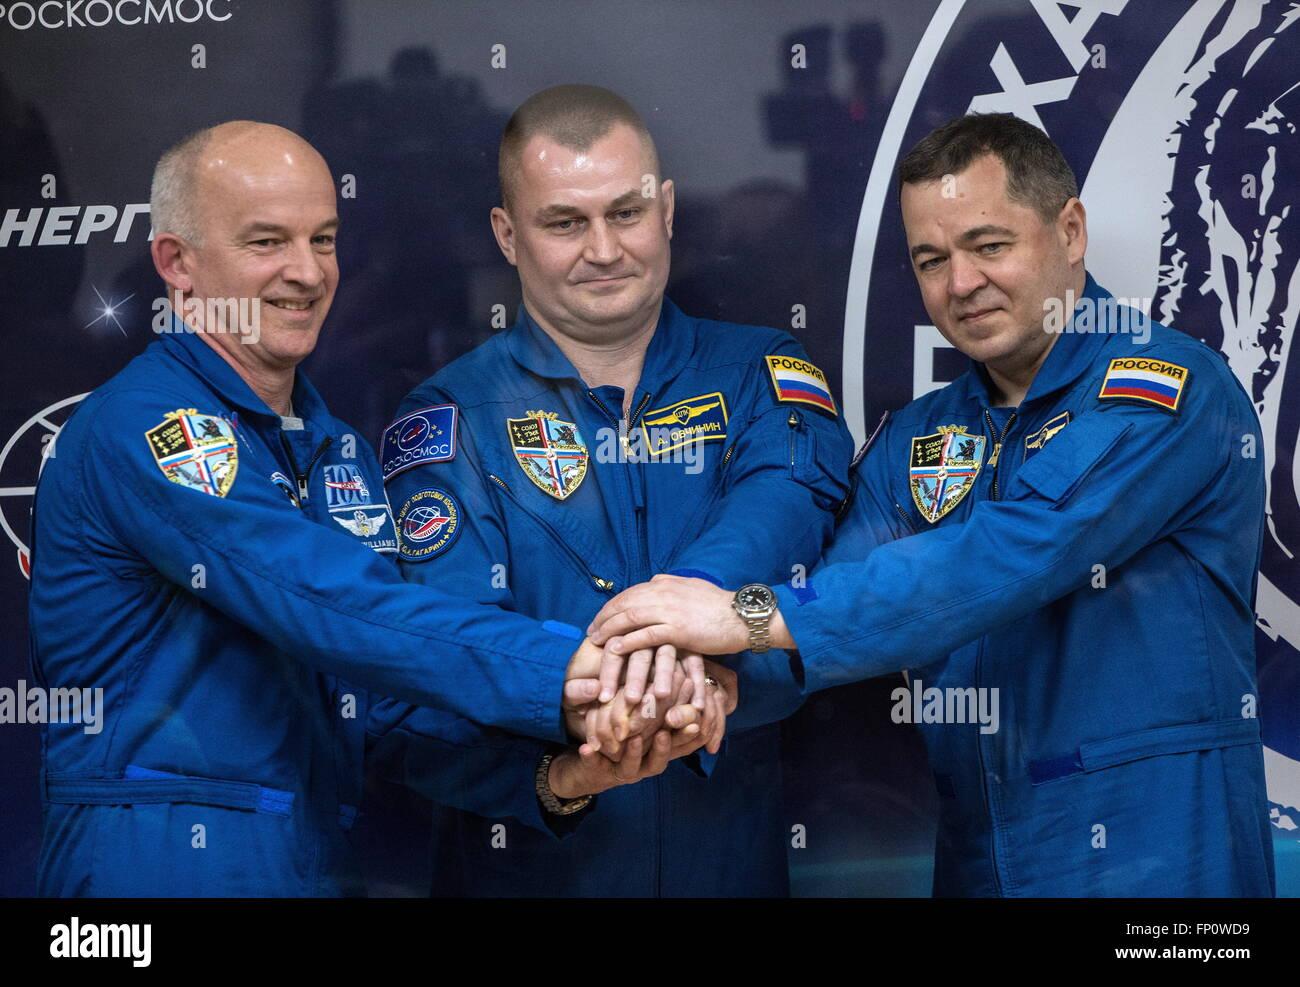 Baikonur, Kazakhstan. 17th Mar, 2016. International Space Station Expedition 47/48 main crew members, astronaut - Stock Image